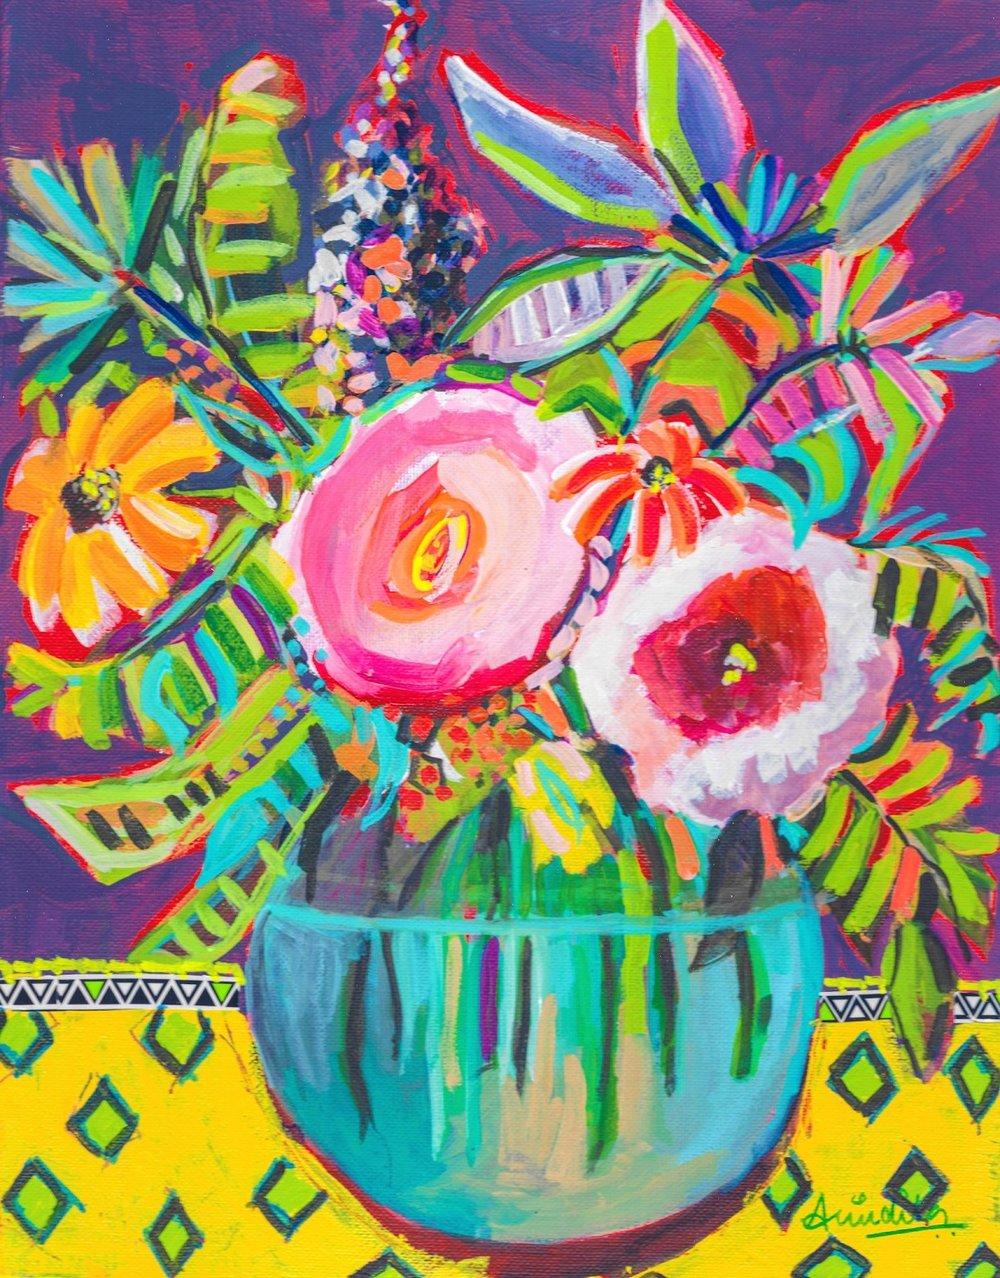 Harmony. 2019, Acrylic on canvas, 11 x 14 inches, $225